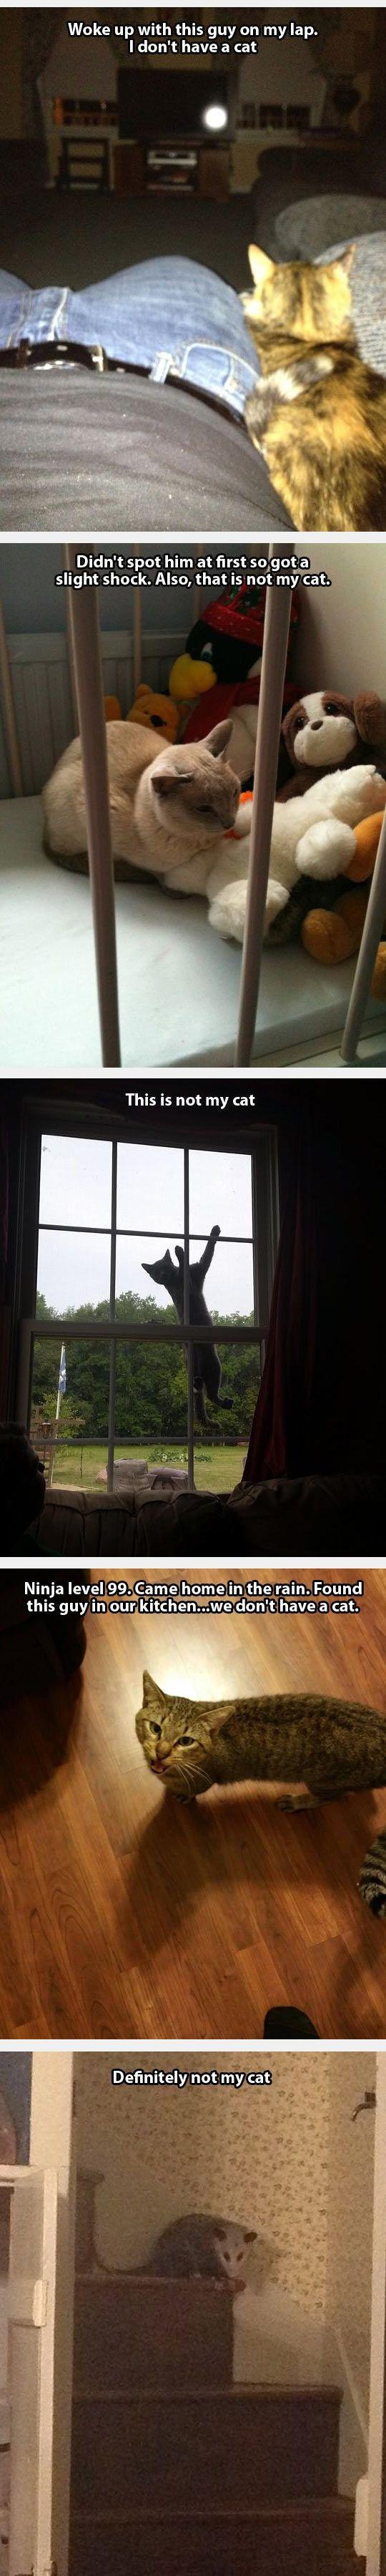 Not my cat 😻 😊